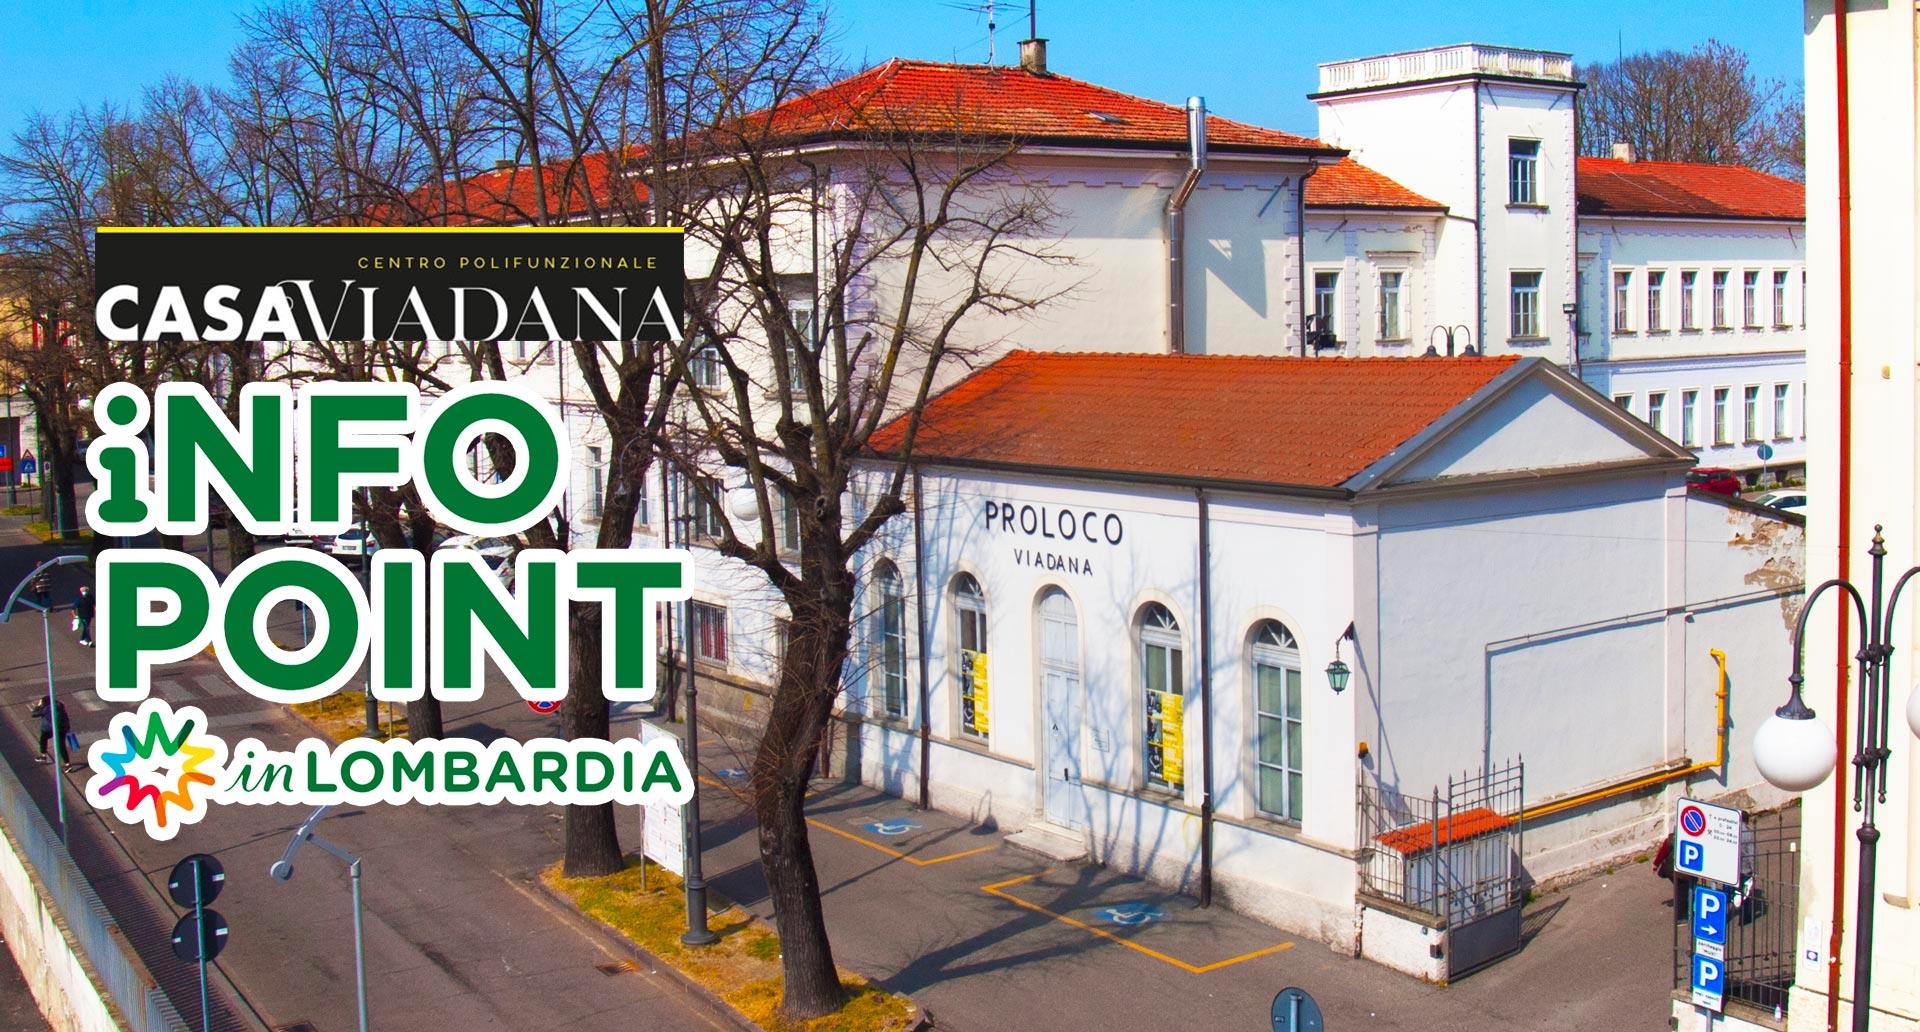 Proloco Viadana - Infopoint